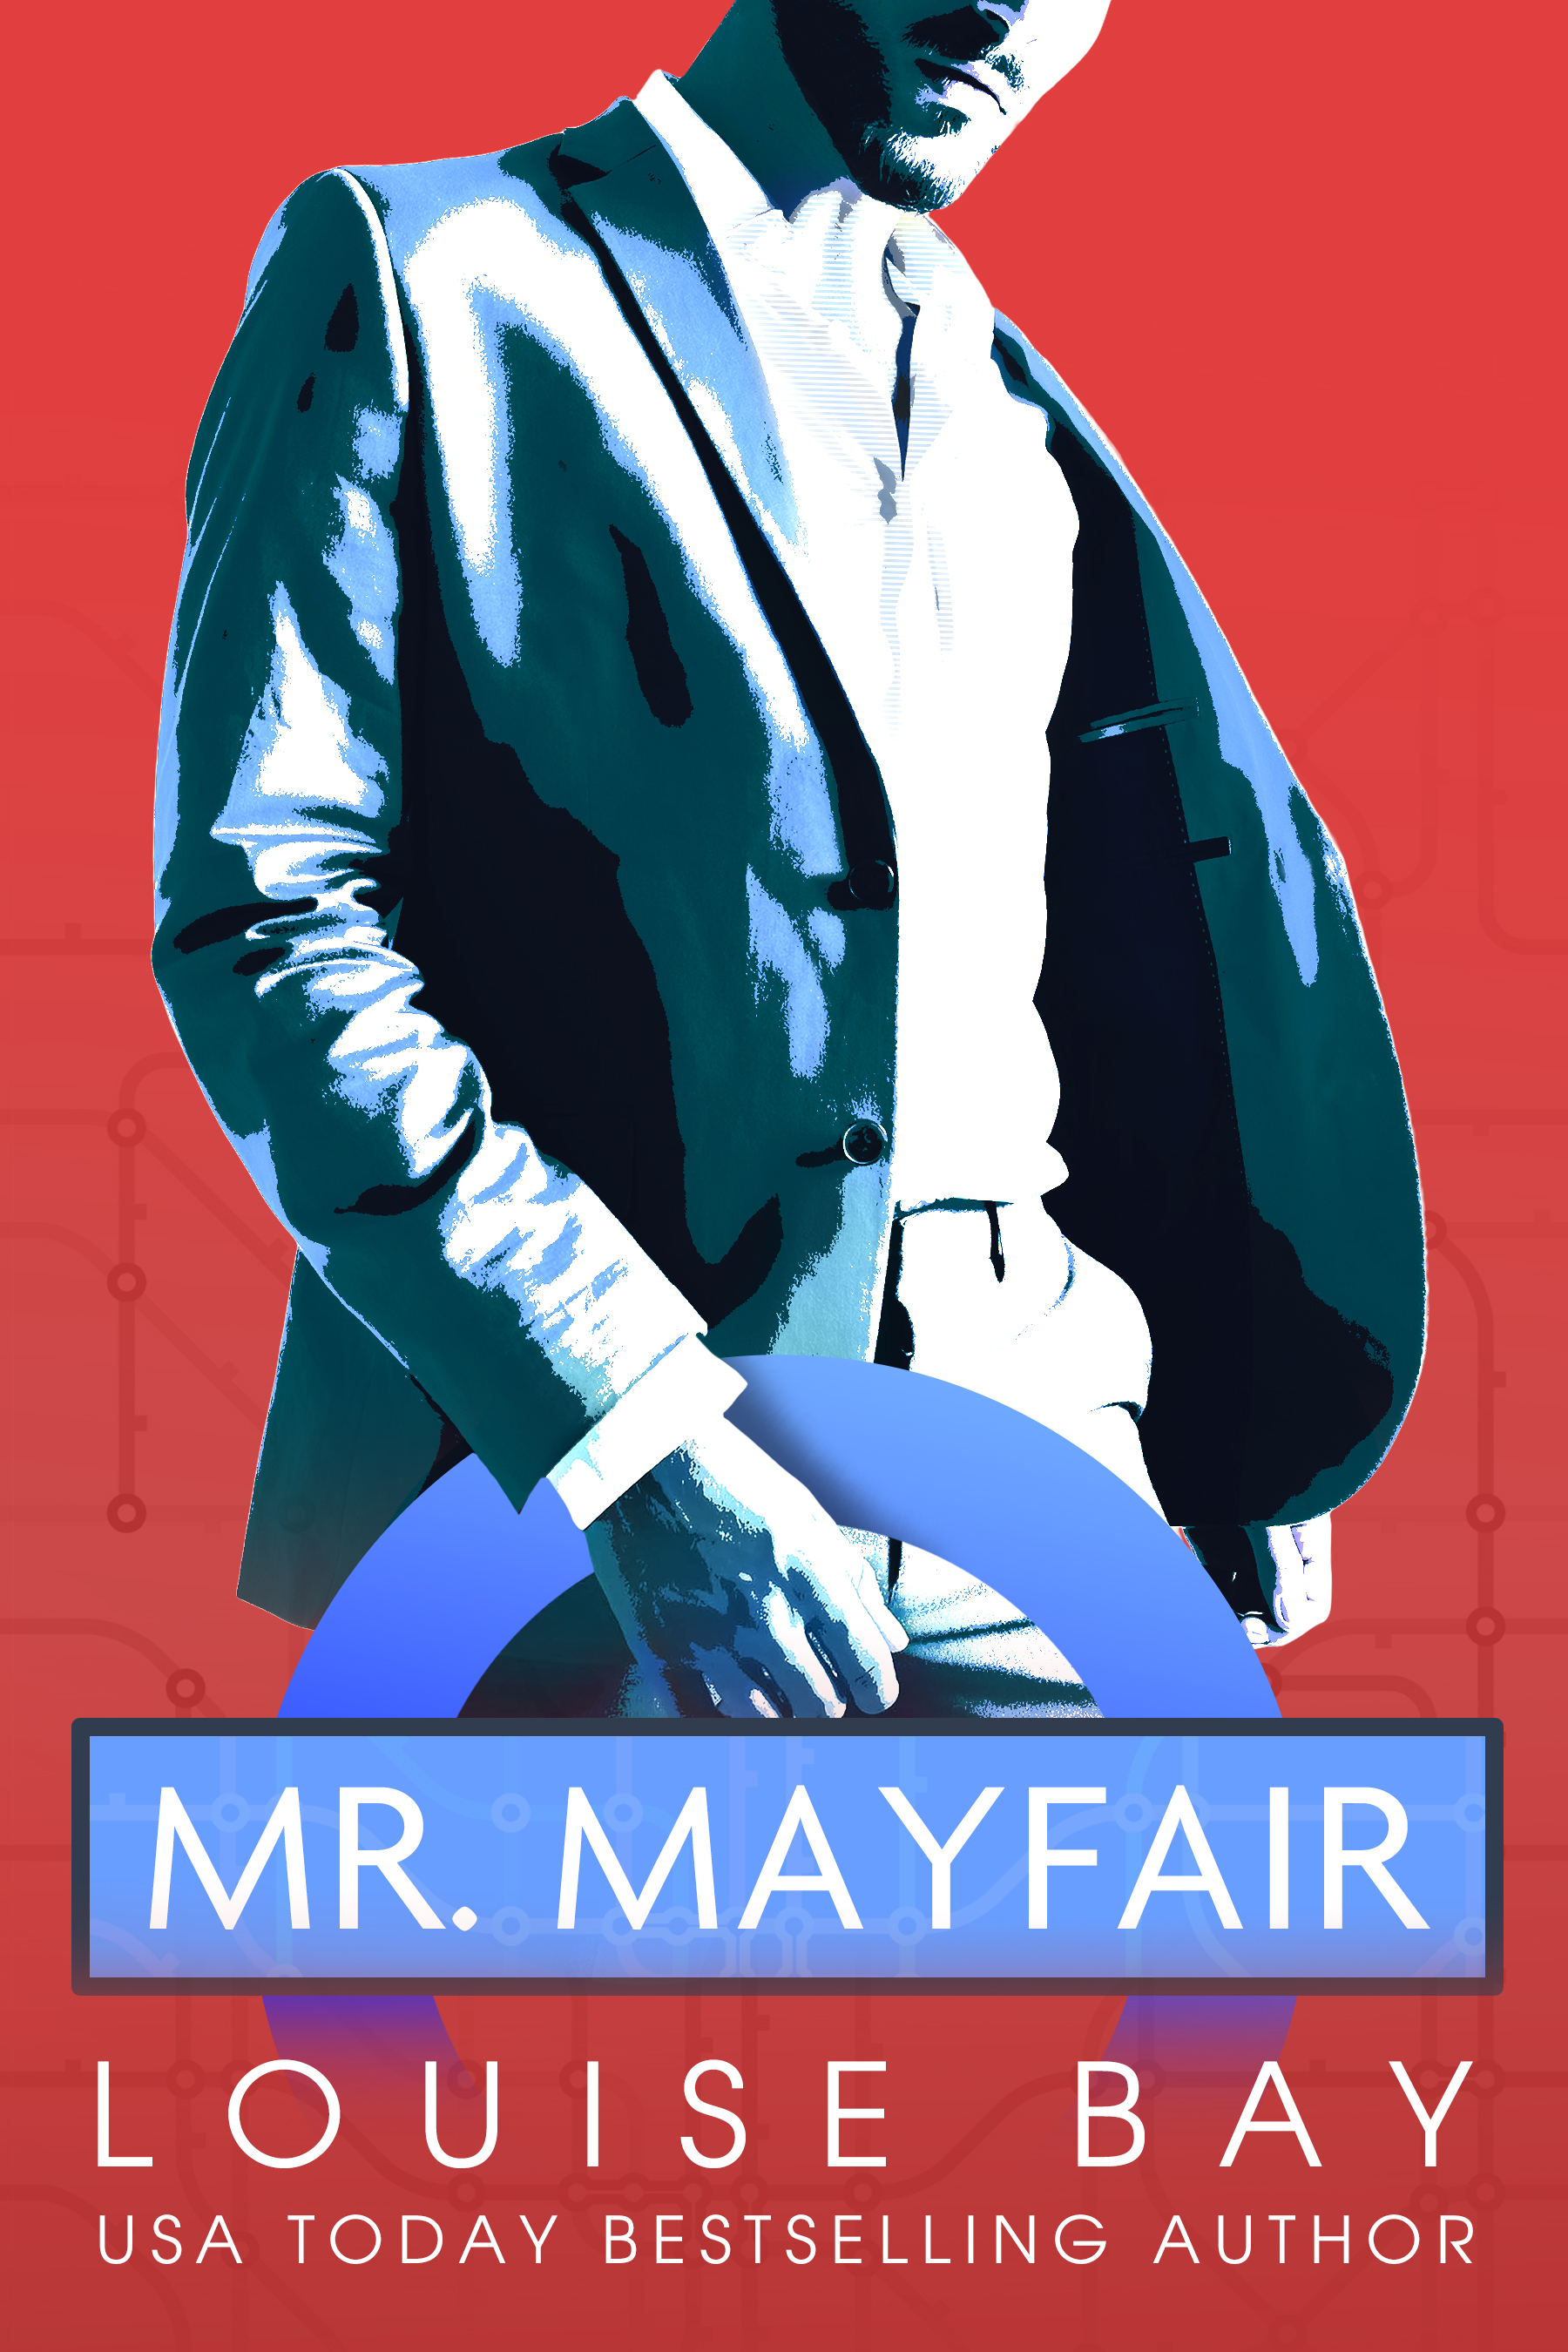 Mr. Mayfair - Louise Bay